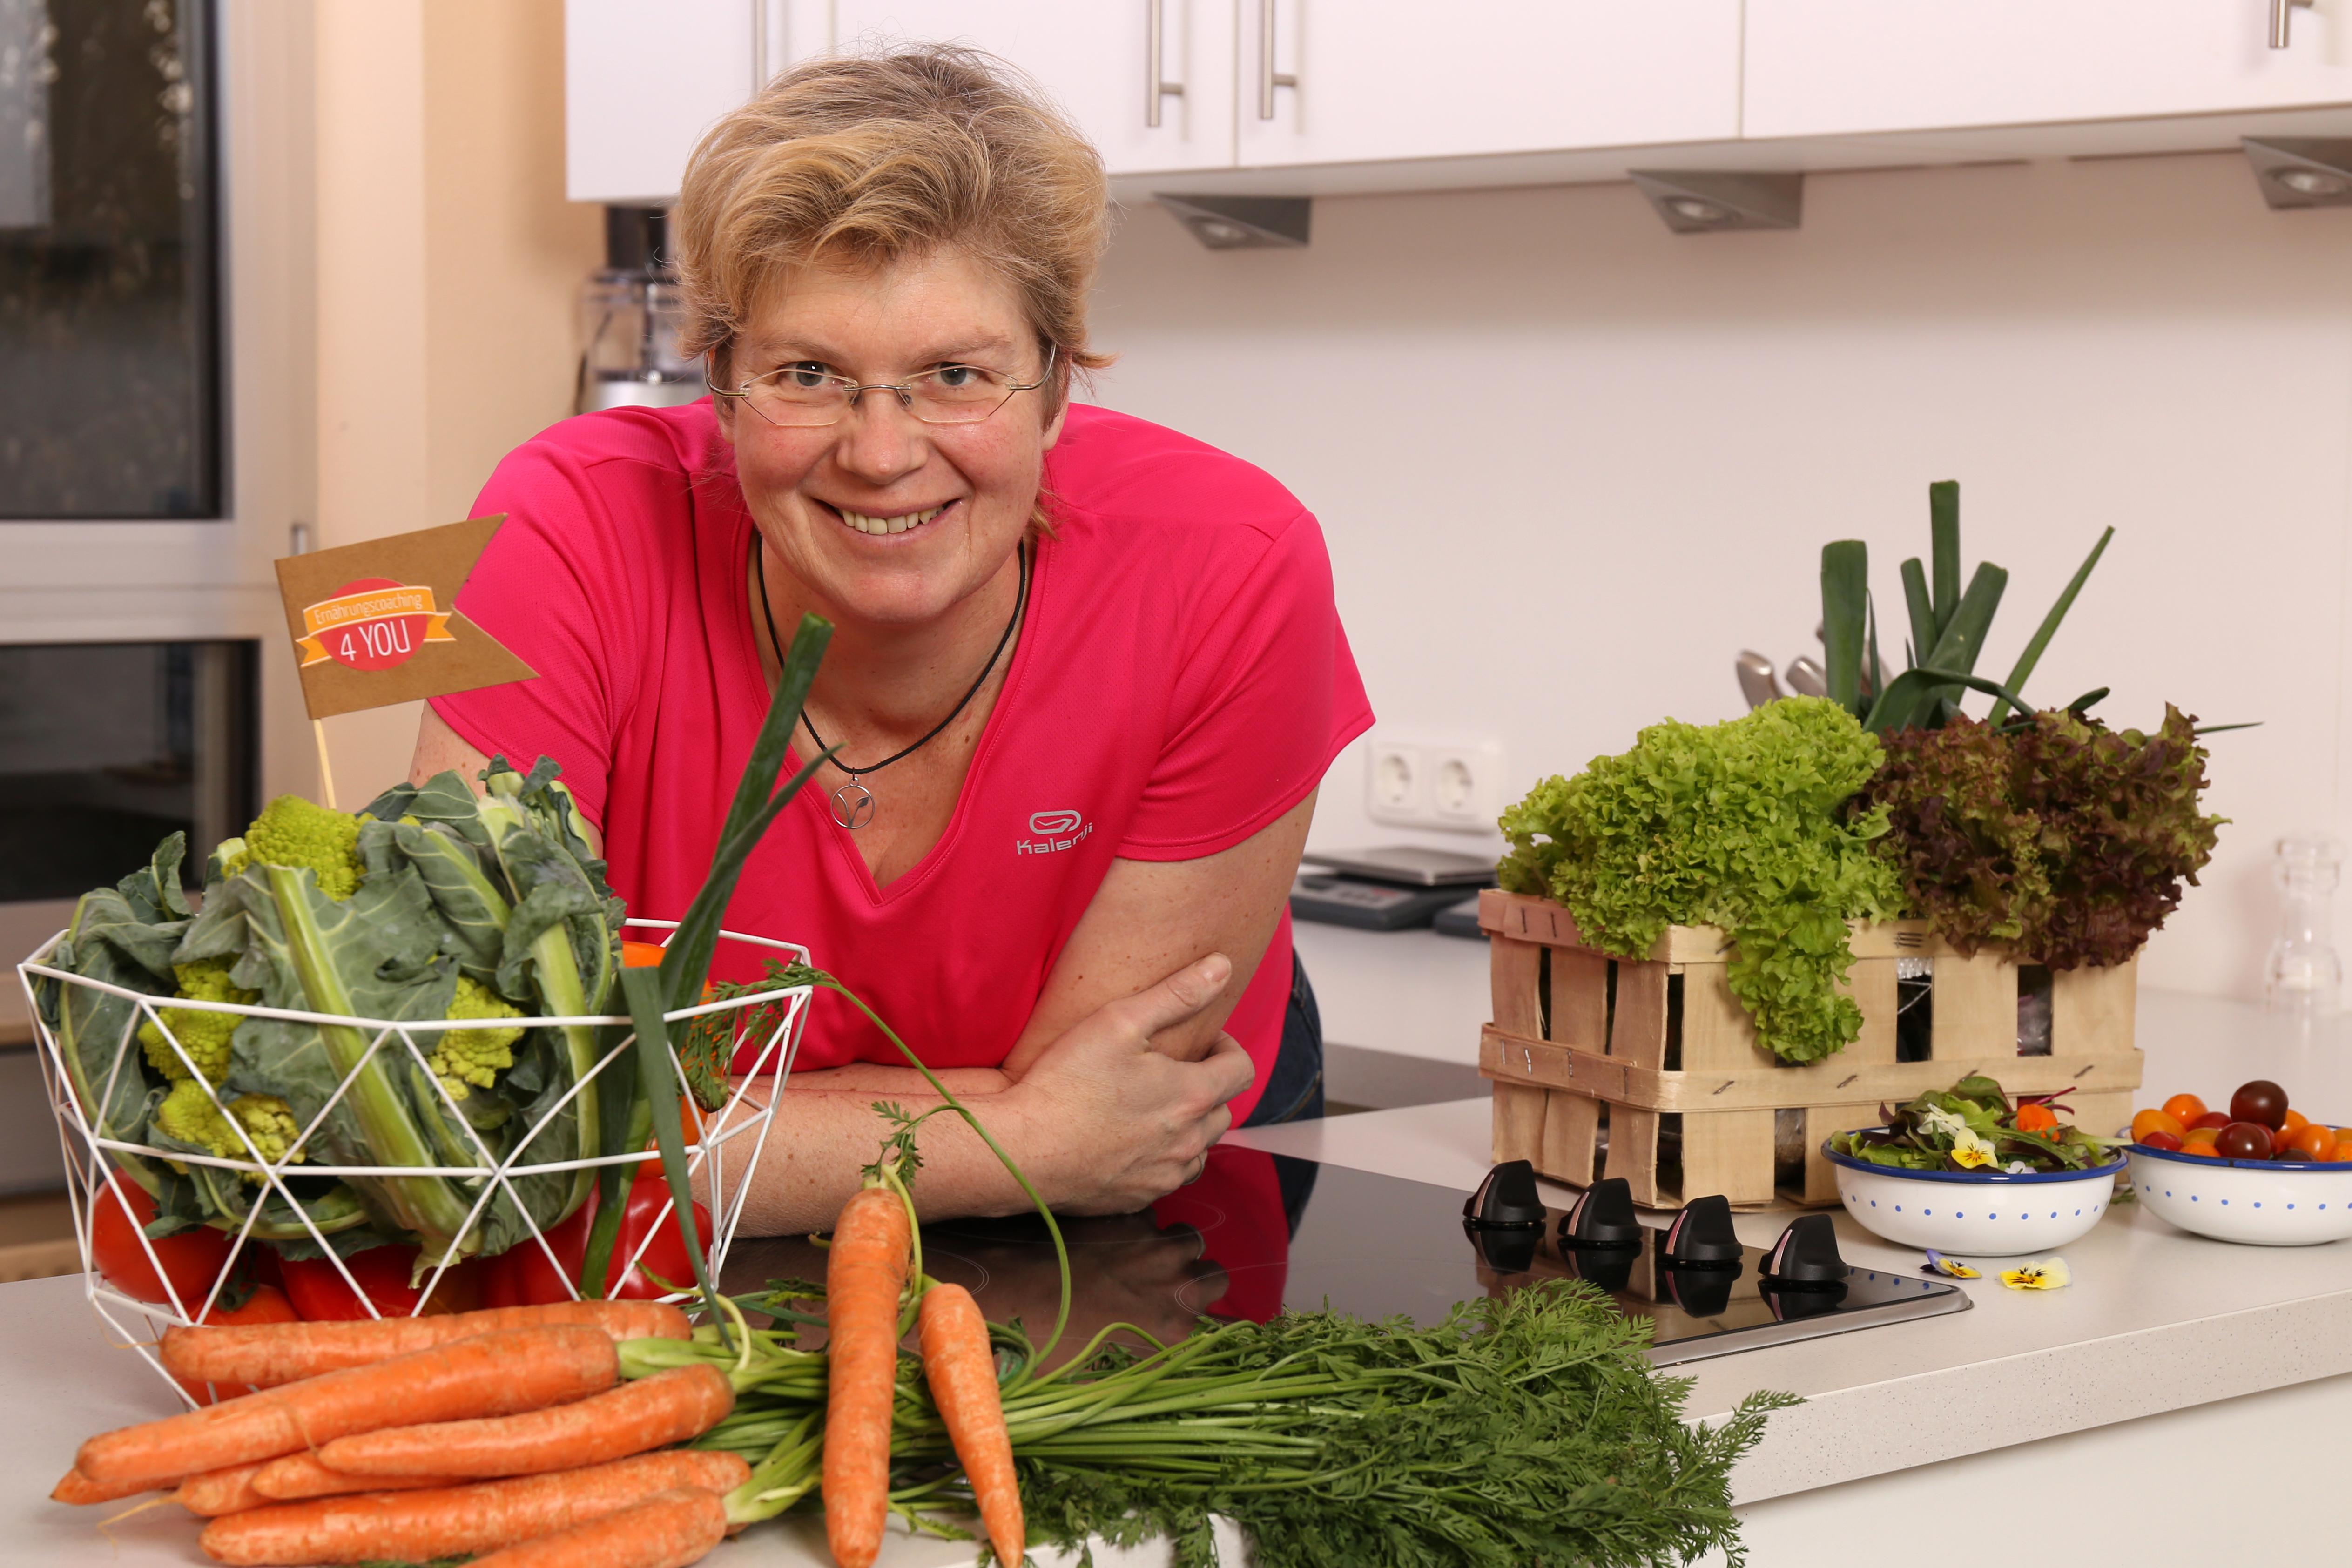 Nicola Herrmann, Hebamme, Ernährungsberaterin